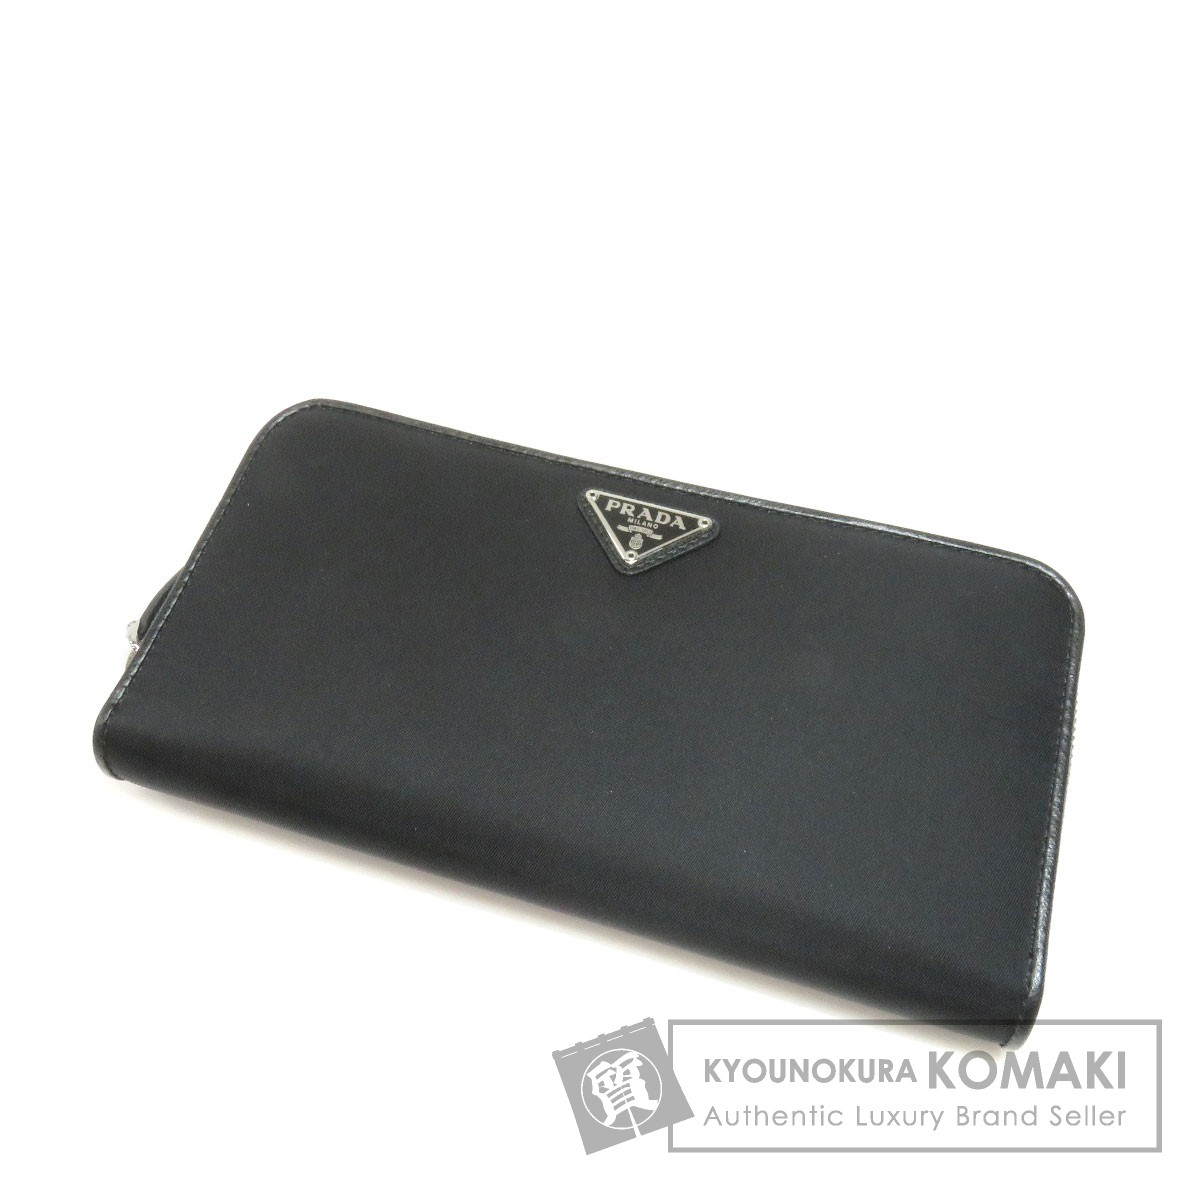 PRADA ロゴプレート 長財布(小銭入れあり) ナイロン素材 レディース 【中古】【プラダ】